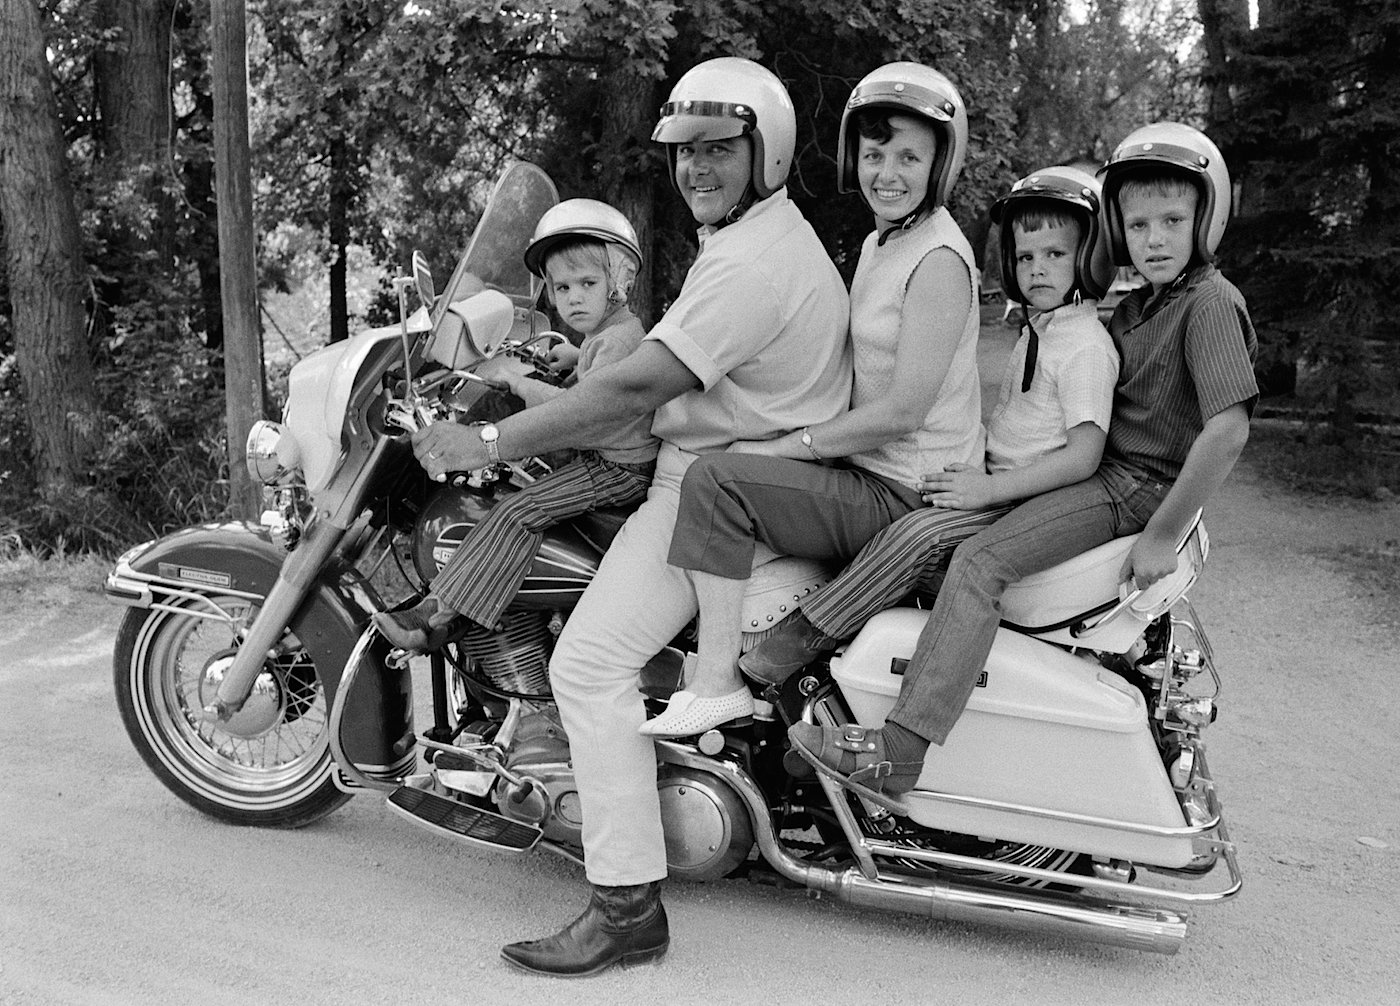 motorcycle family pics  MC Art/Motorcycle Art: A Family Affair